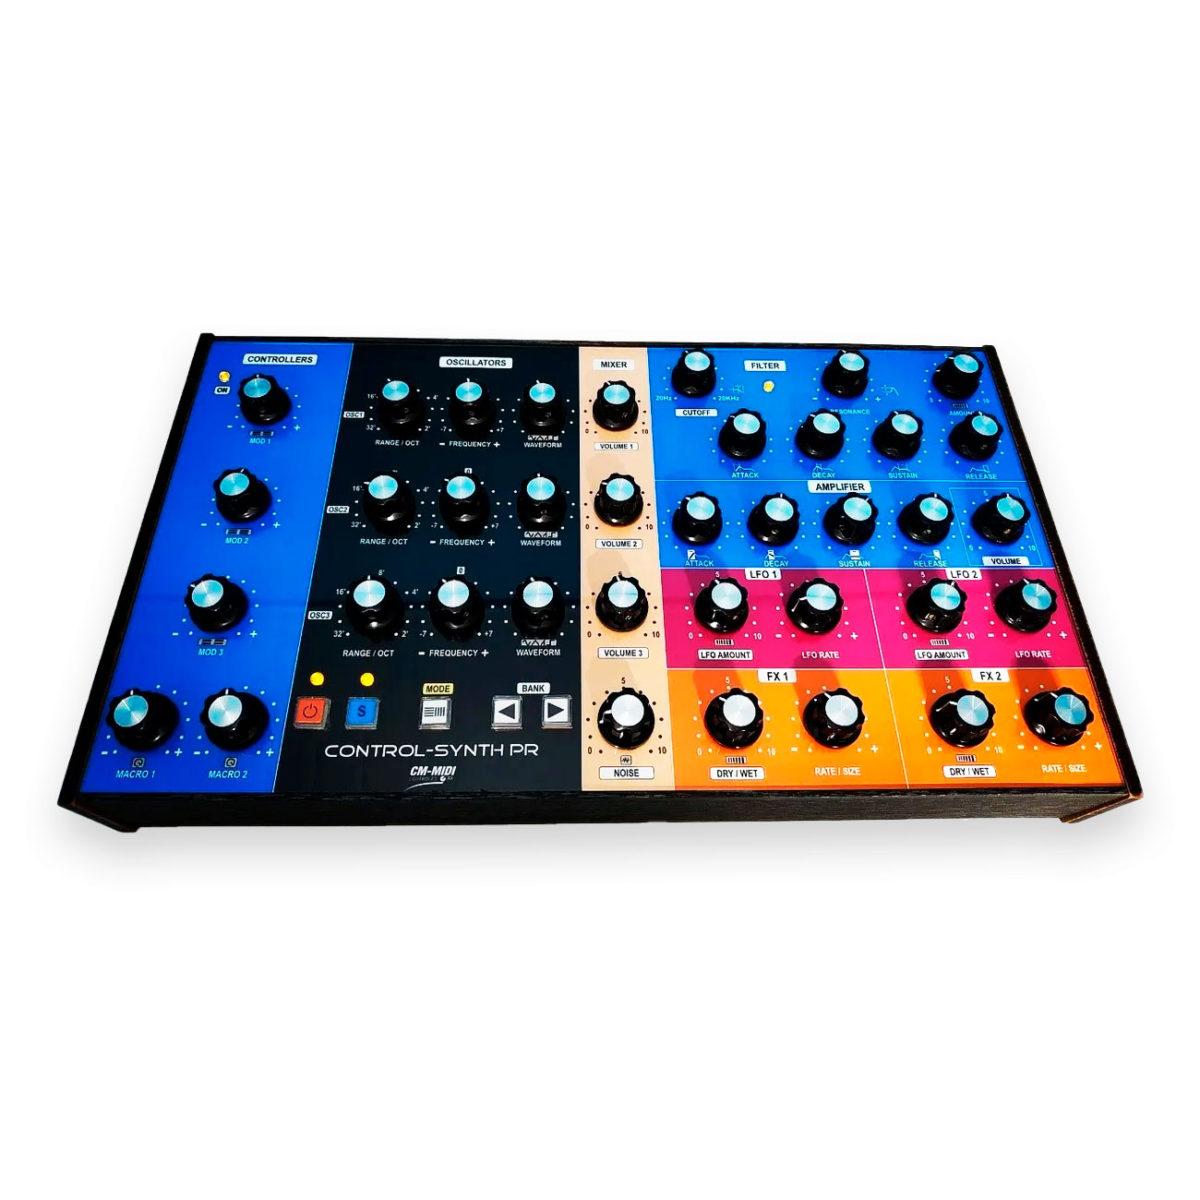 Controlador Midi usb Control-synth Pr